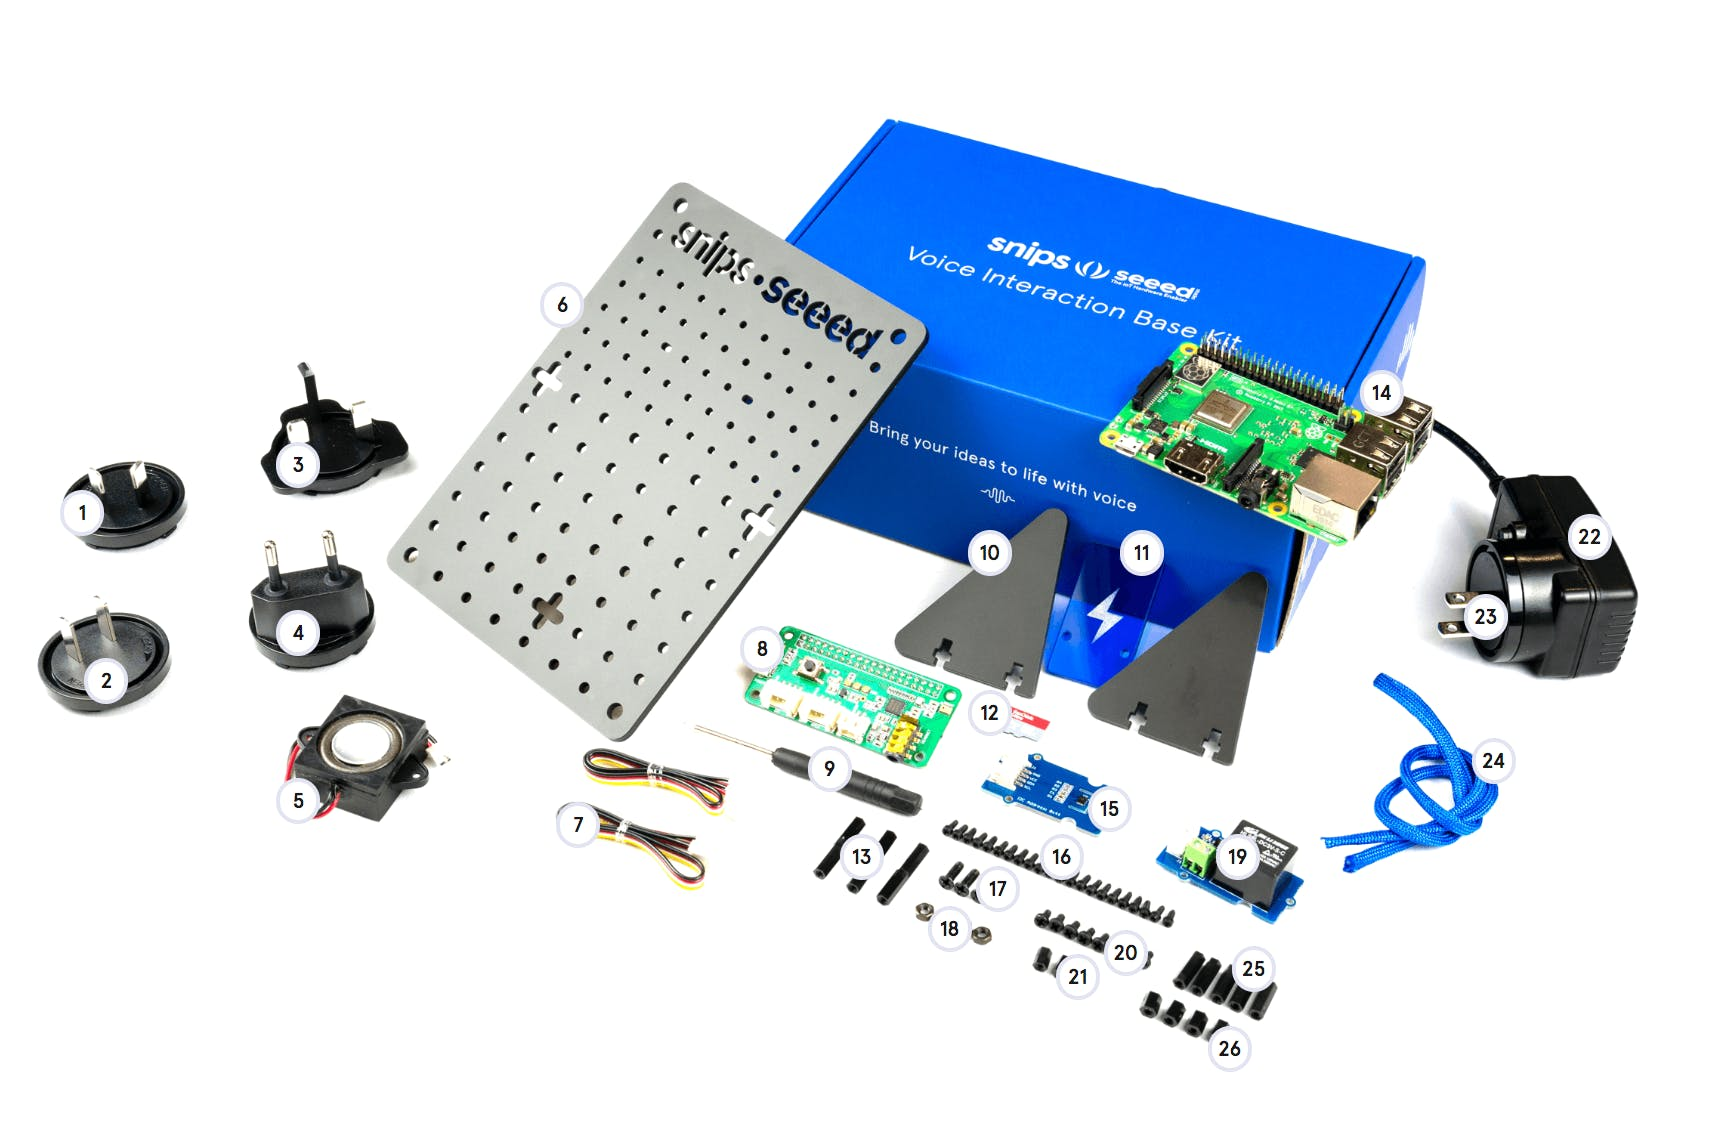 Snips Voice Interaction Development Kit (Base Kit)